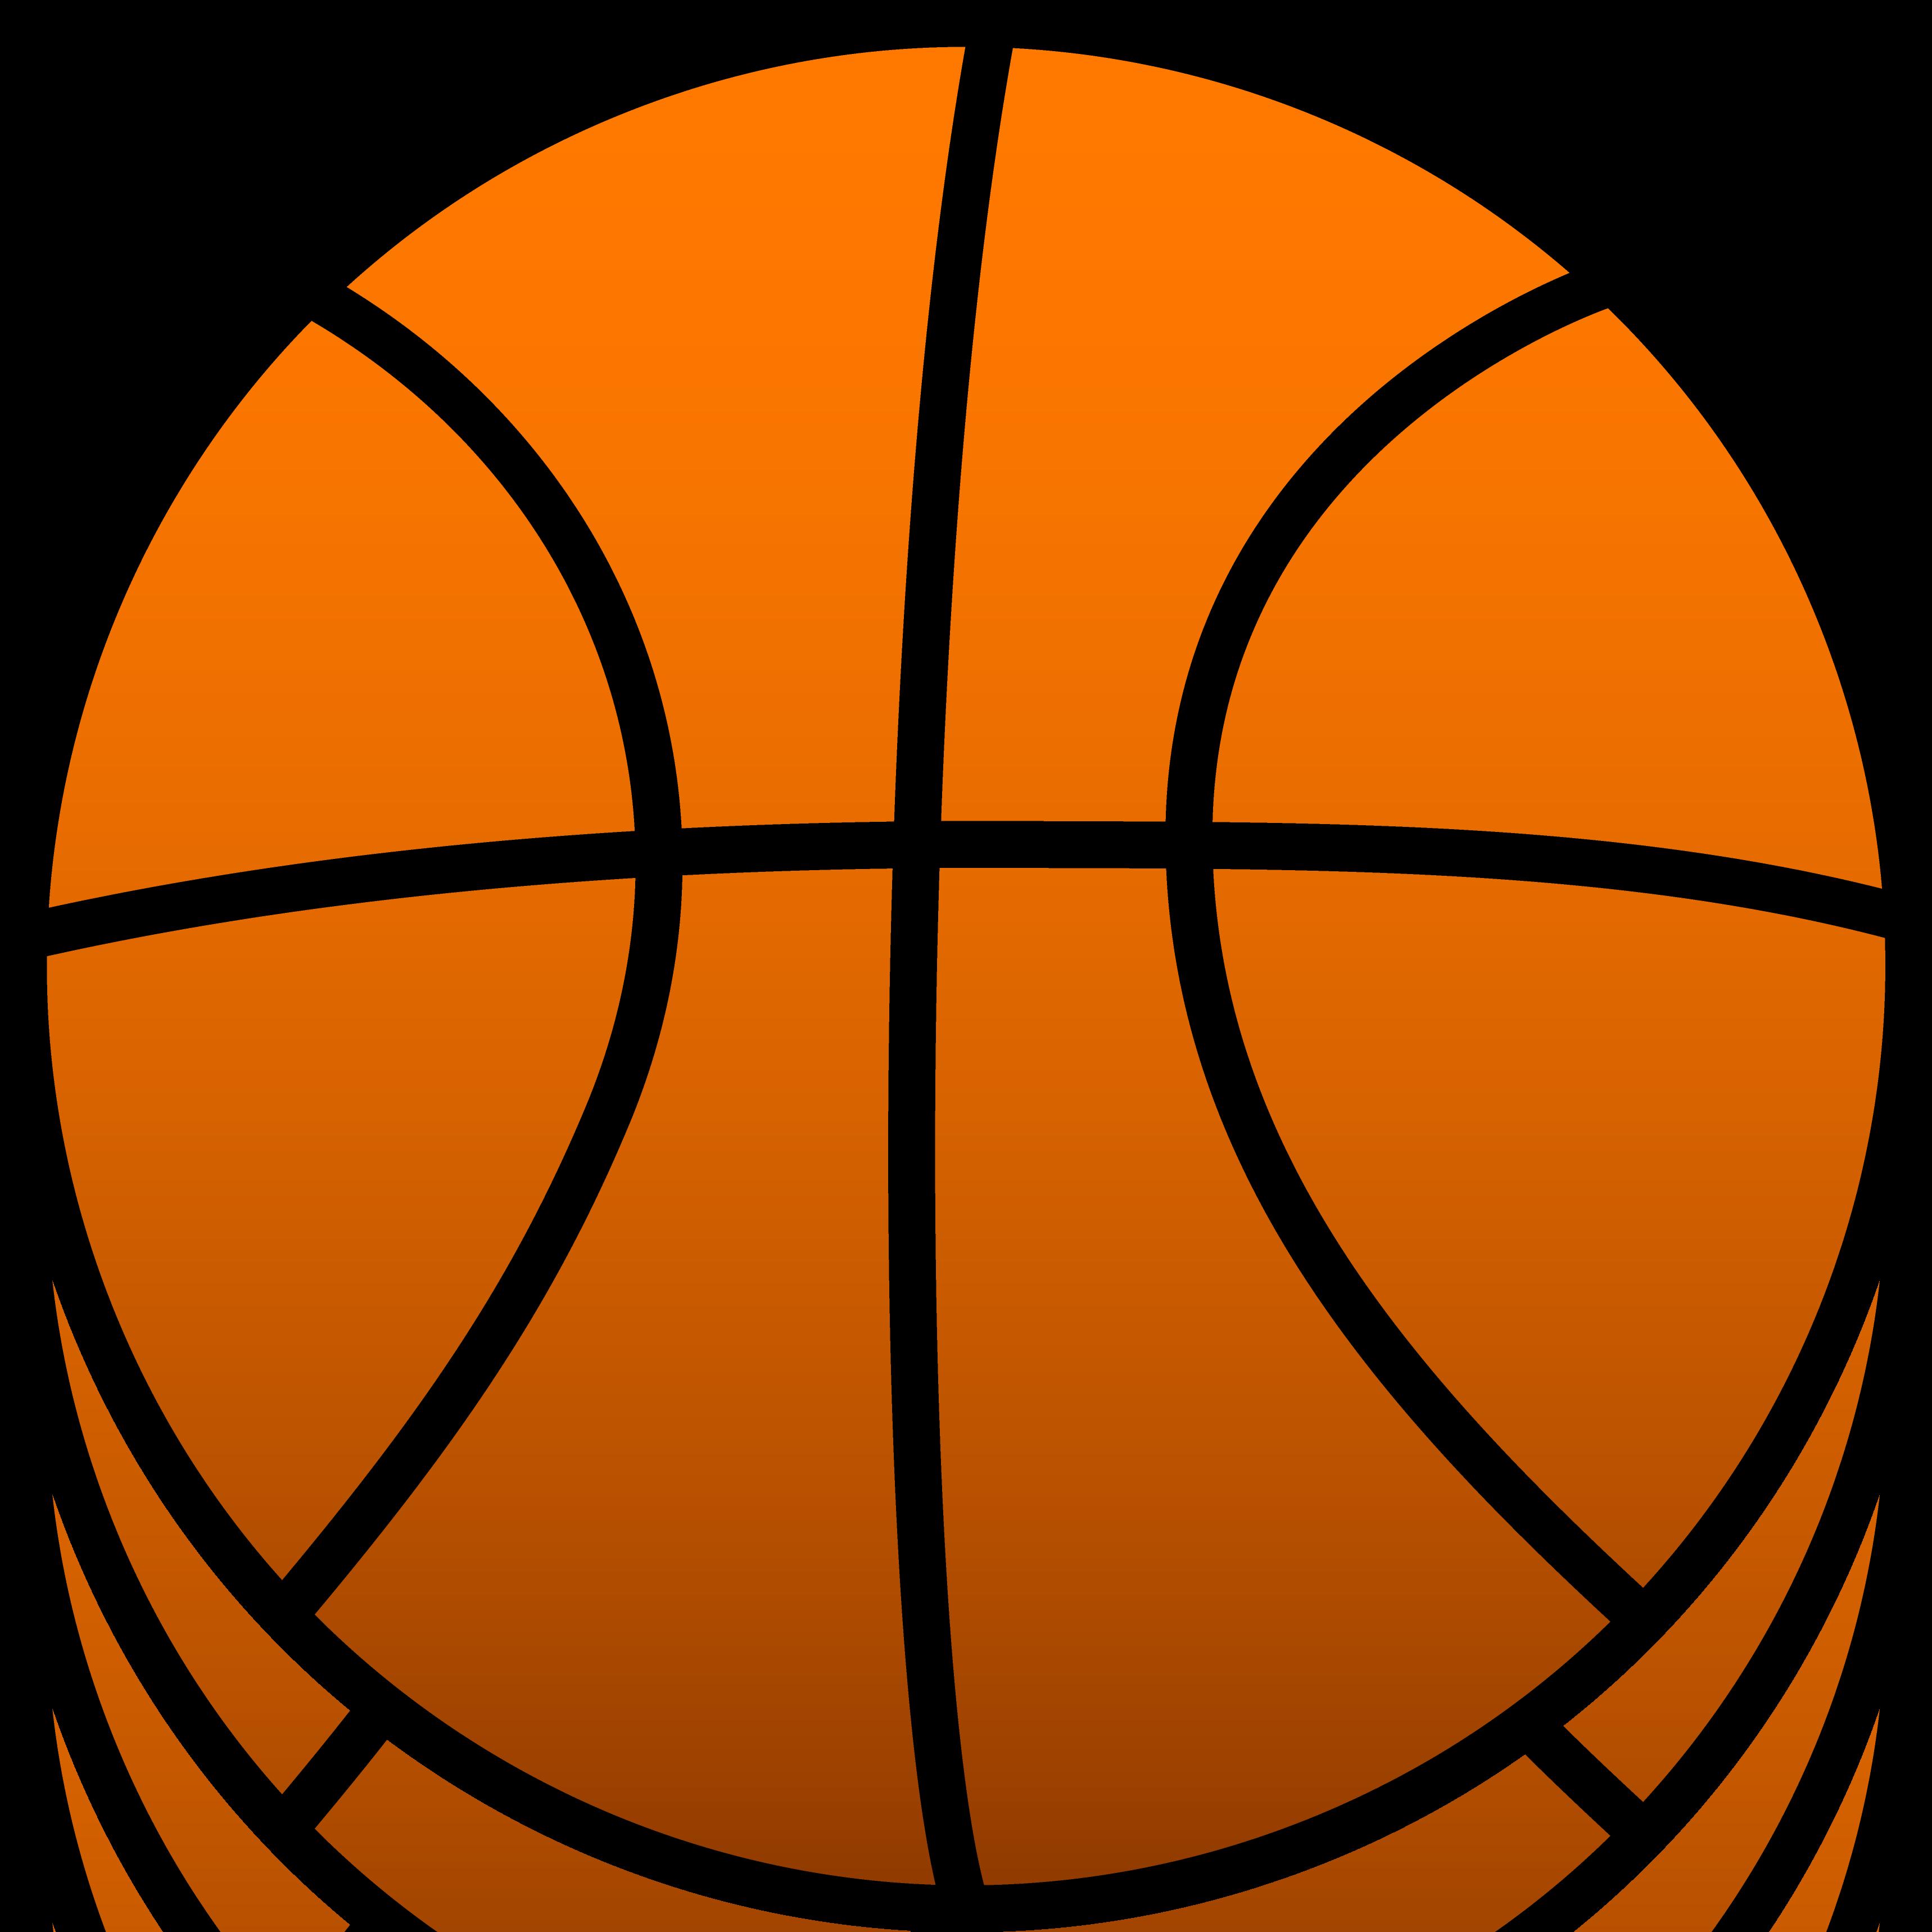 Clipart free basketball. Panda images